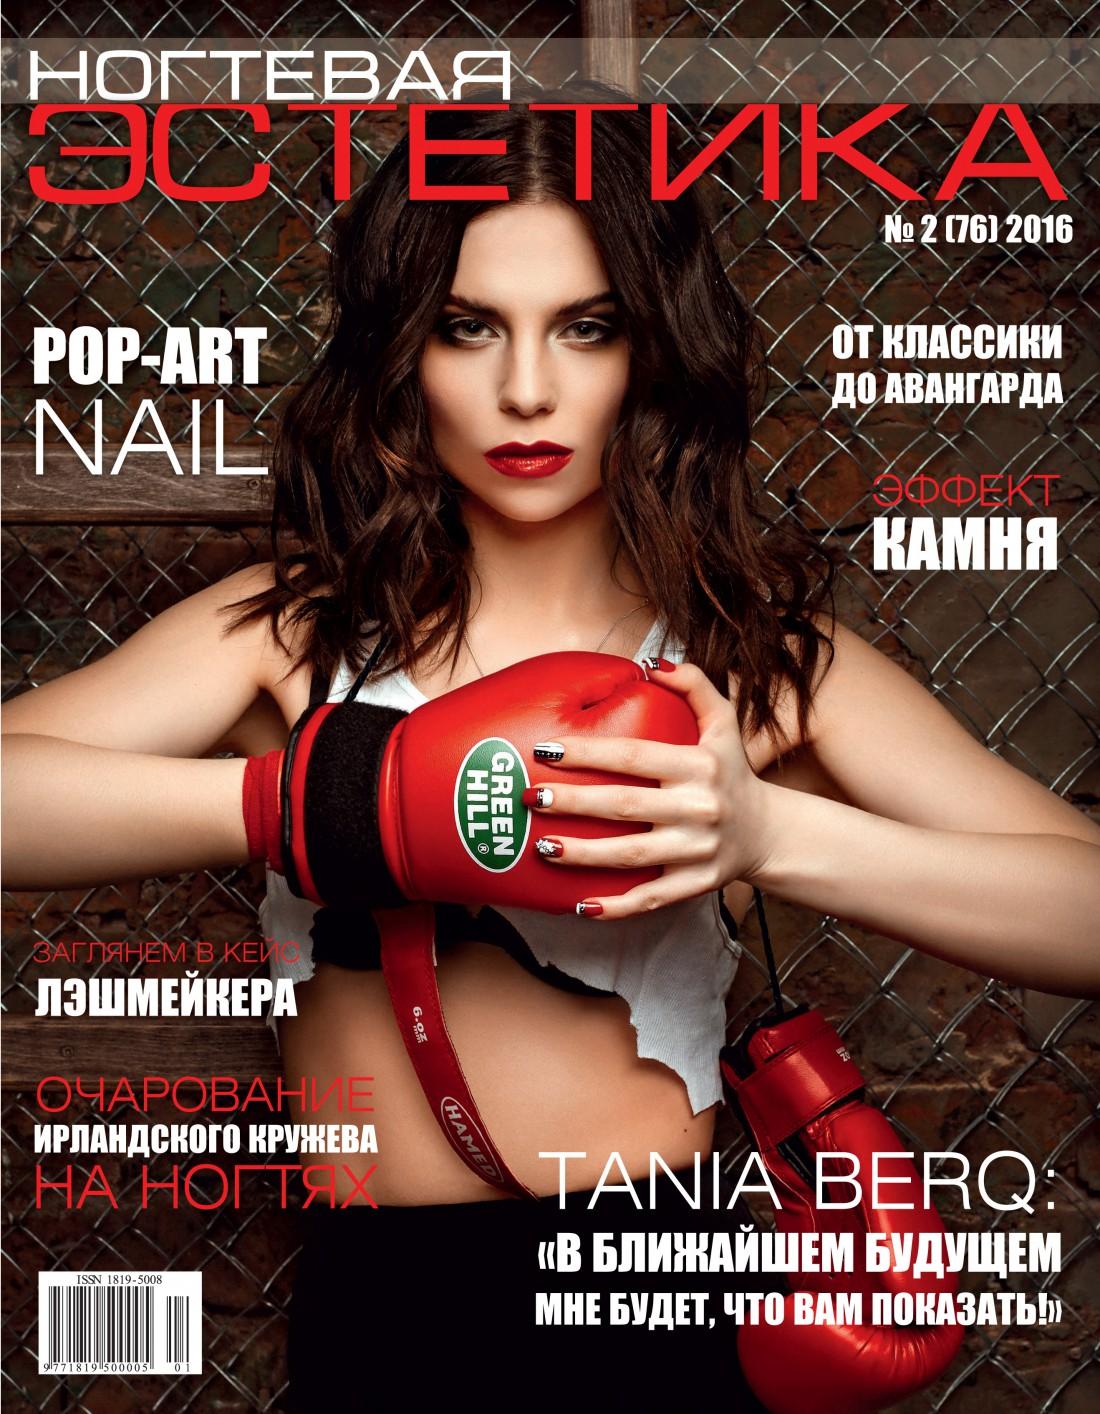 Певица Tania BerQ